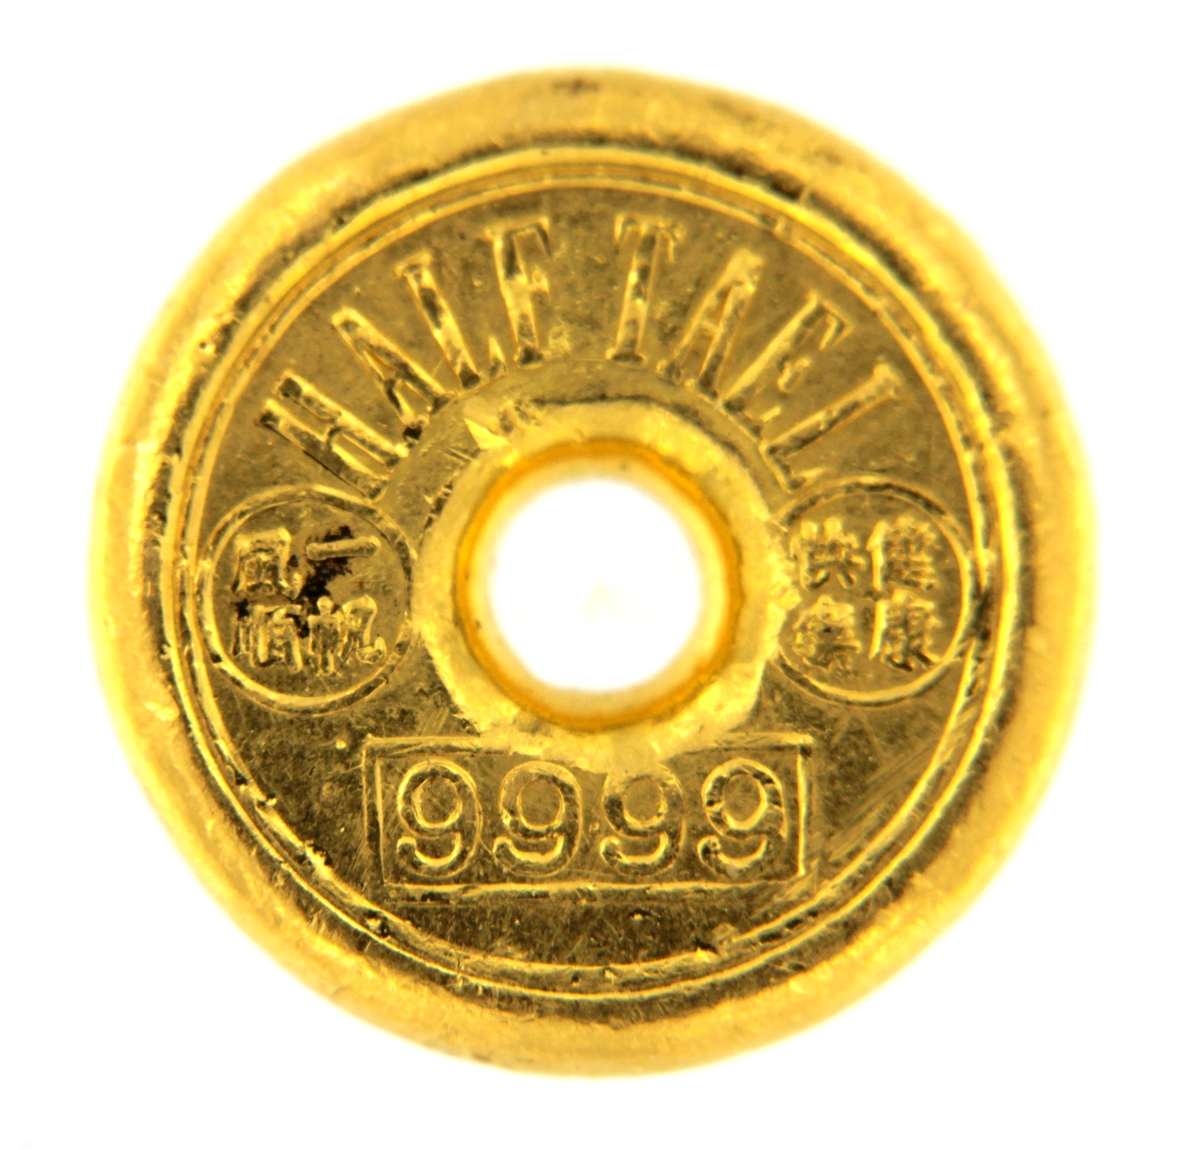 Chow Tai Hong Kong 1 2 Tael 18 71 Gr Cast 24 Carat Gold Bullion Doughnut